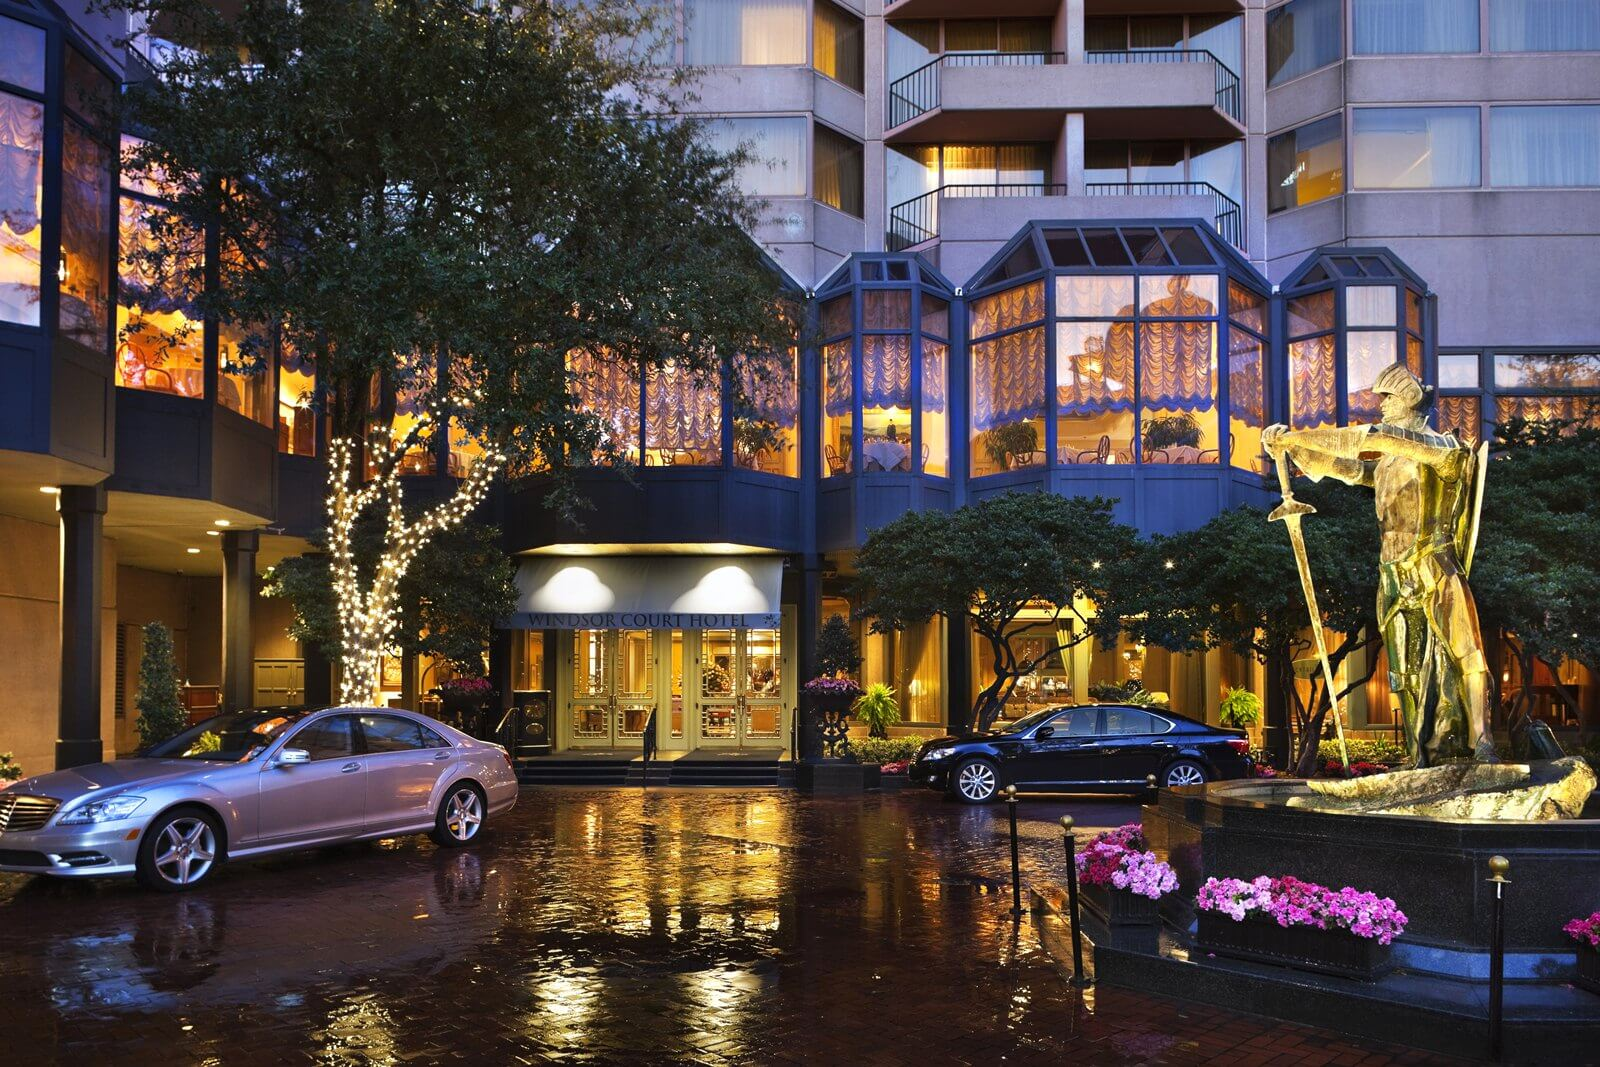 Windsor Court Hotel Courtyard